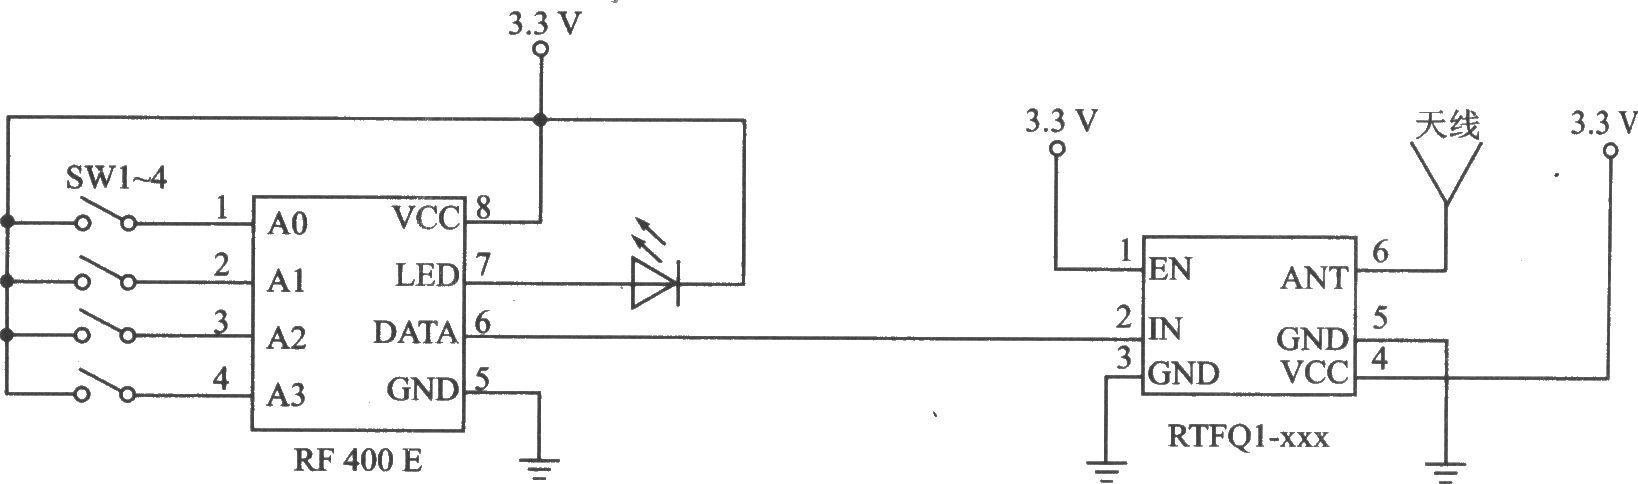 fm-rtfql-xxx的典型应用电路